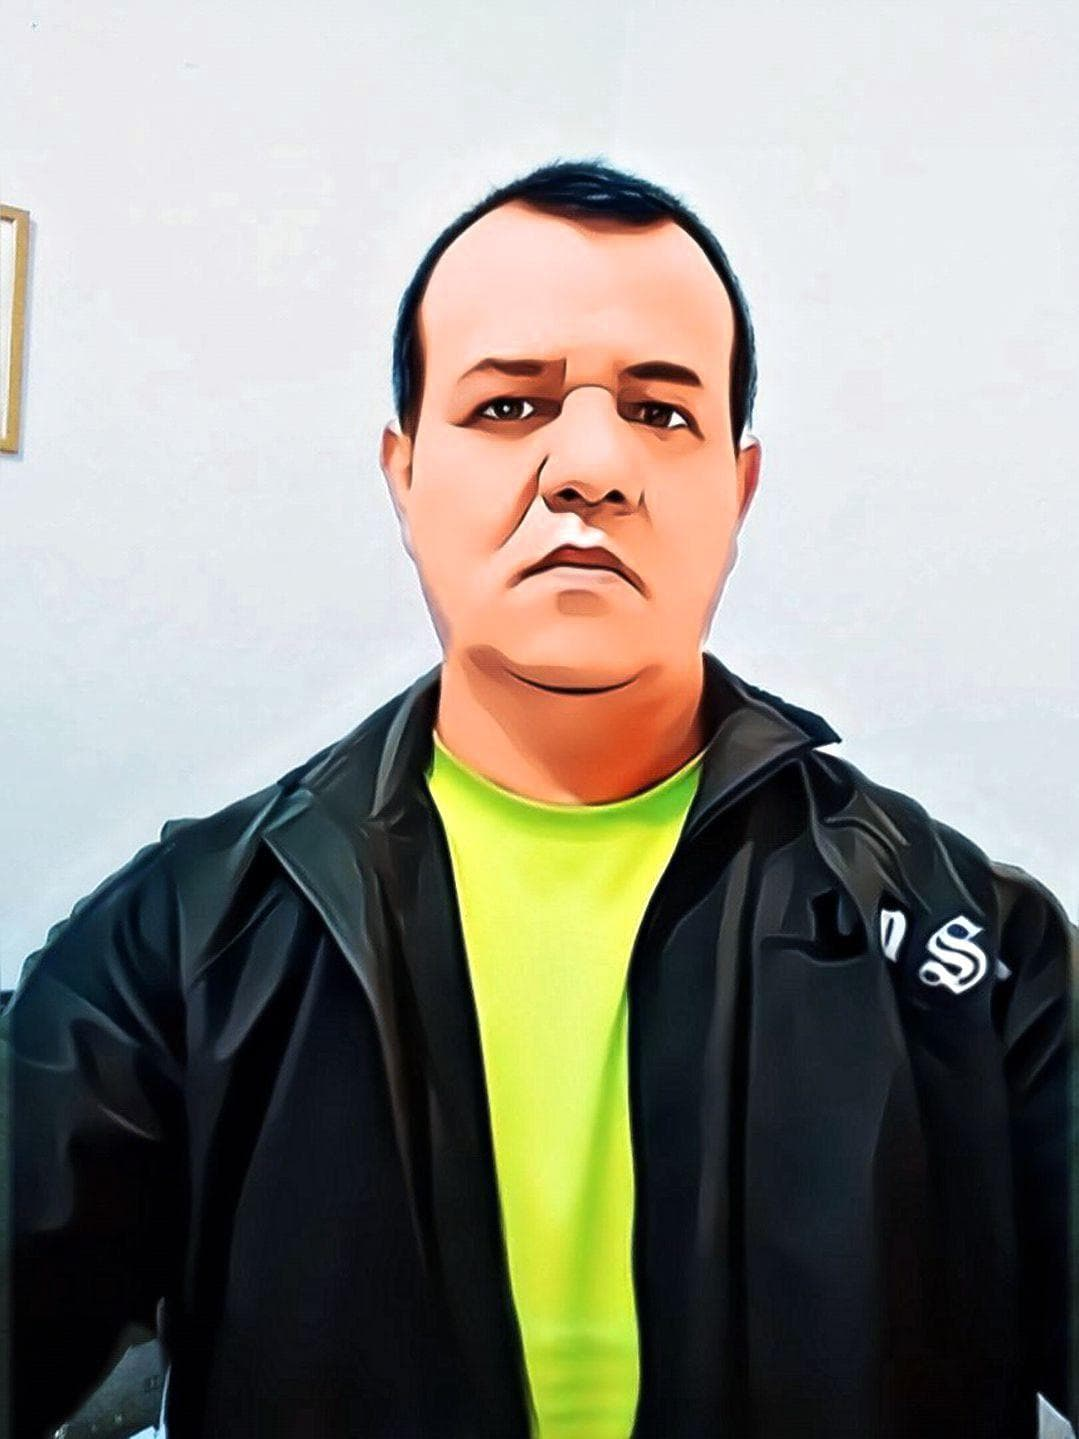 Frank Barroso